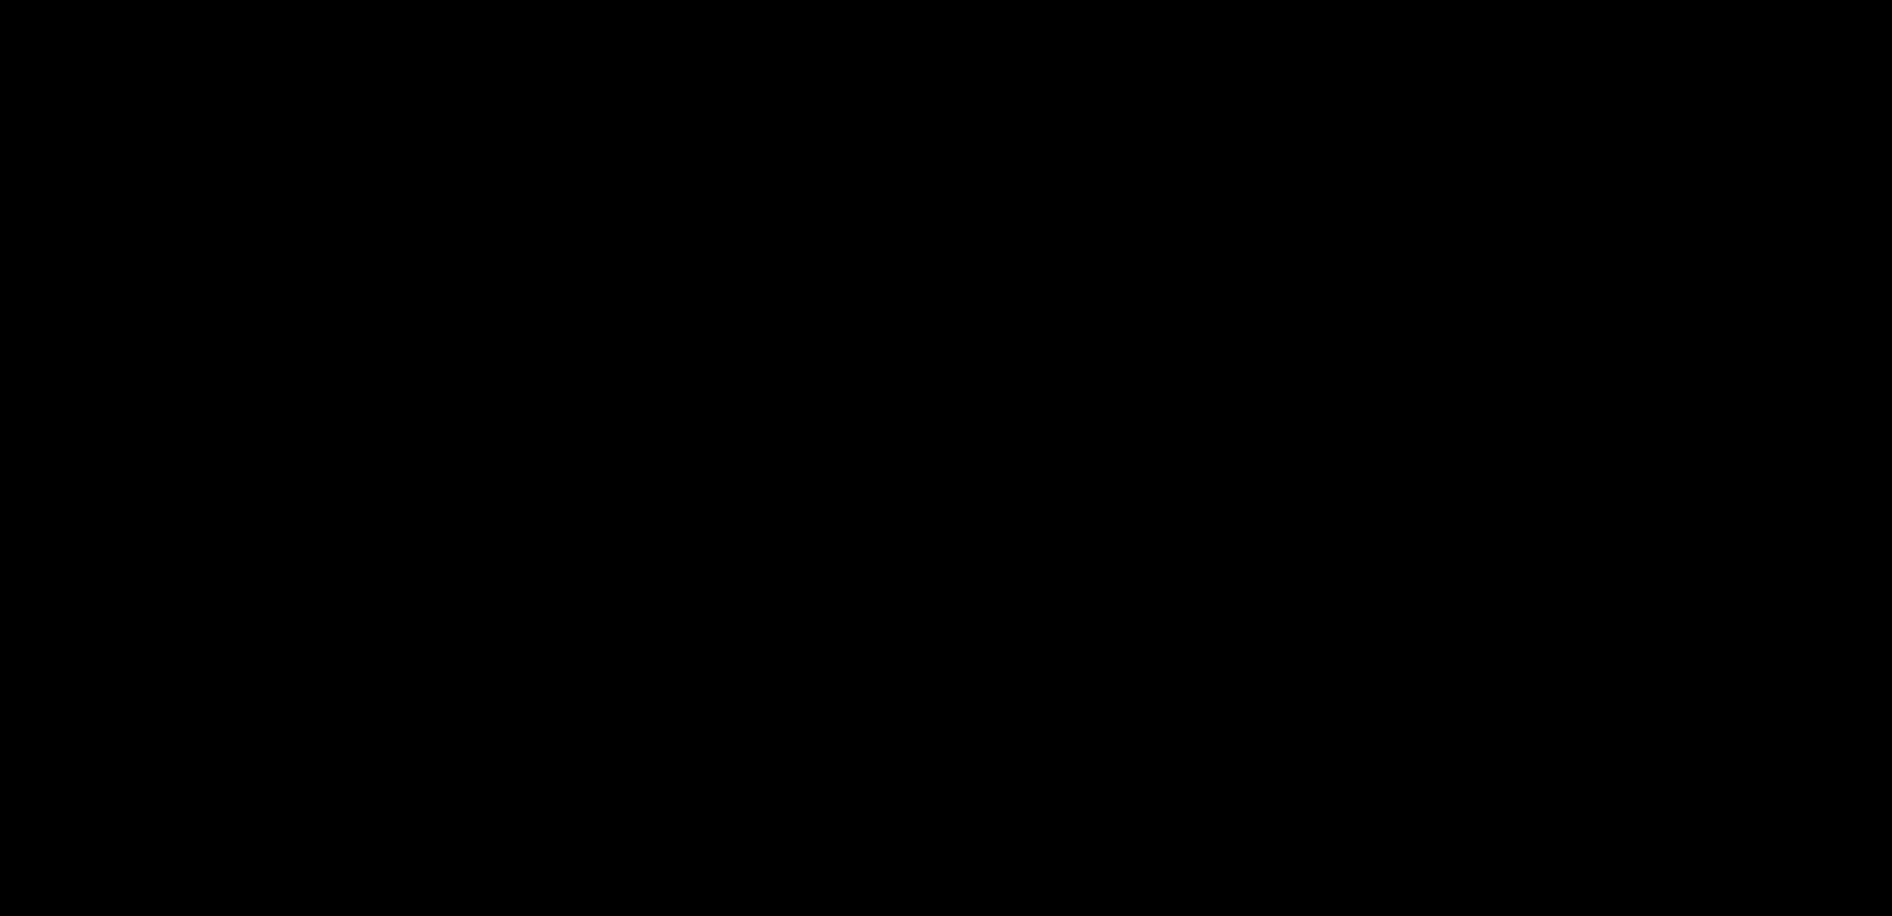 Phenolphthalein β-D-glucuronide